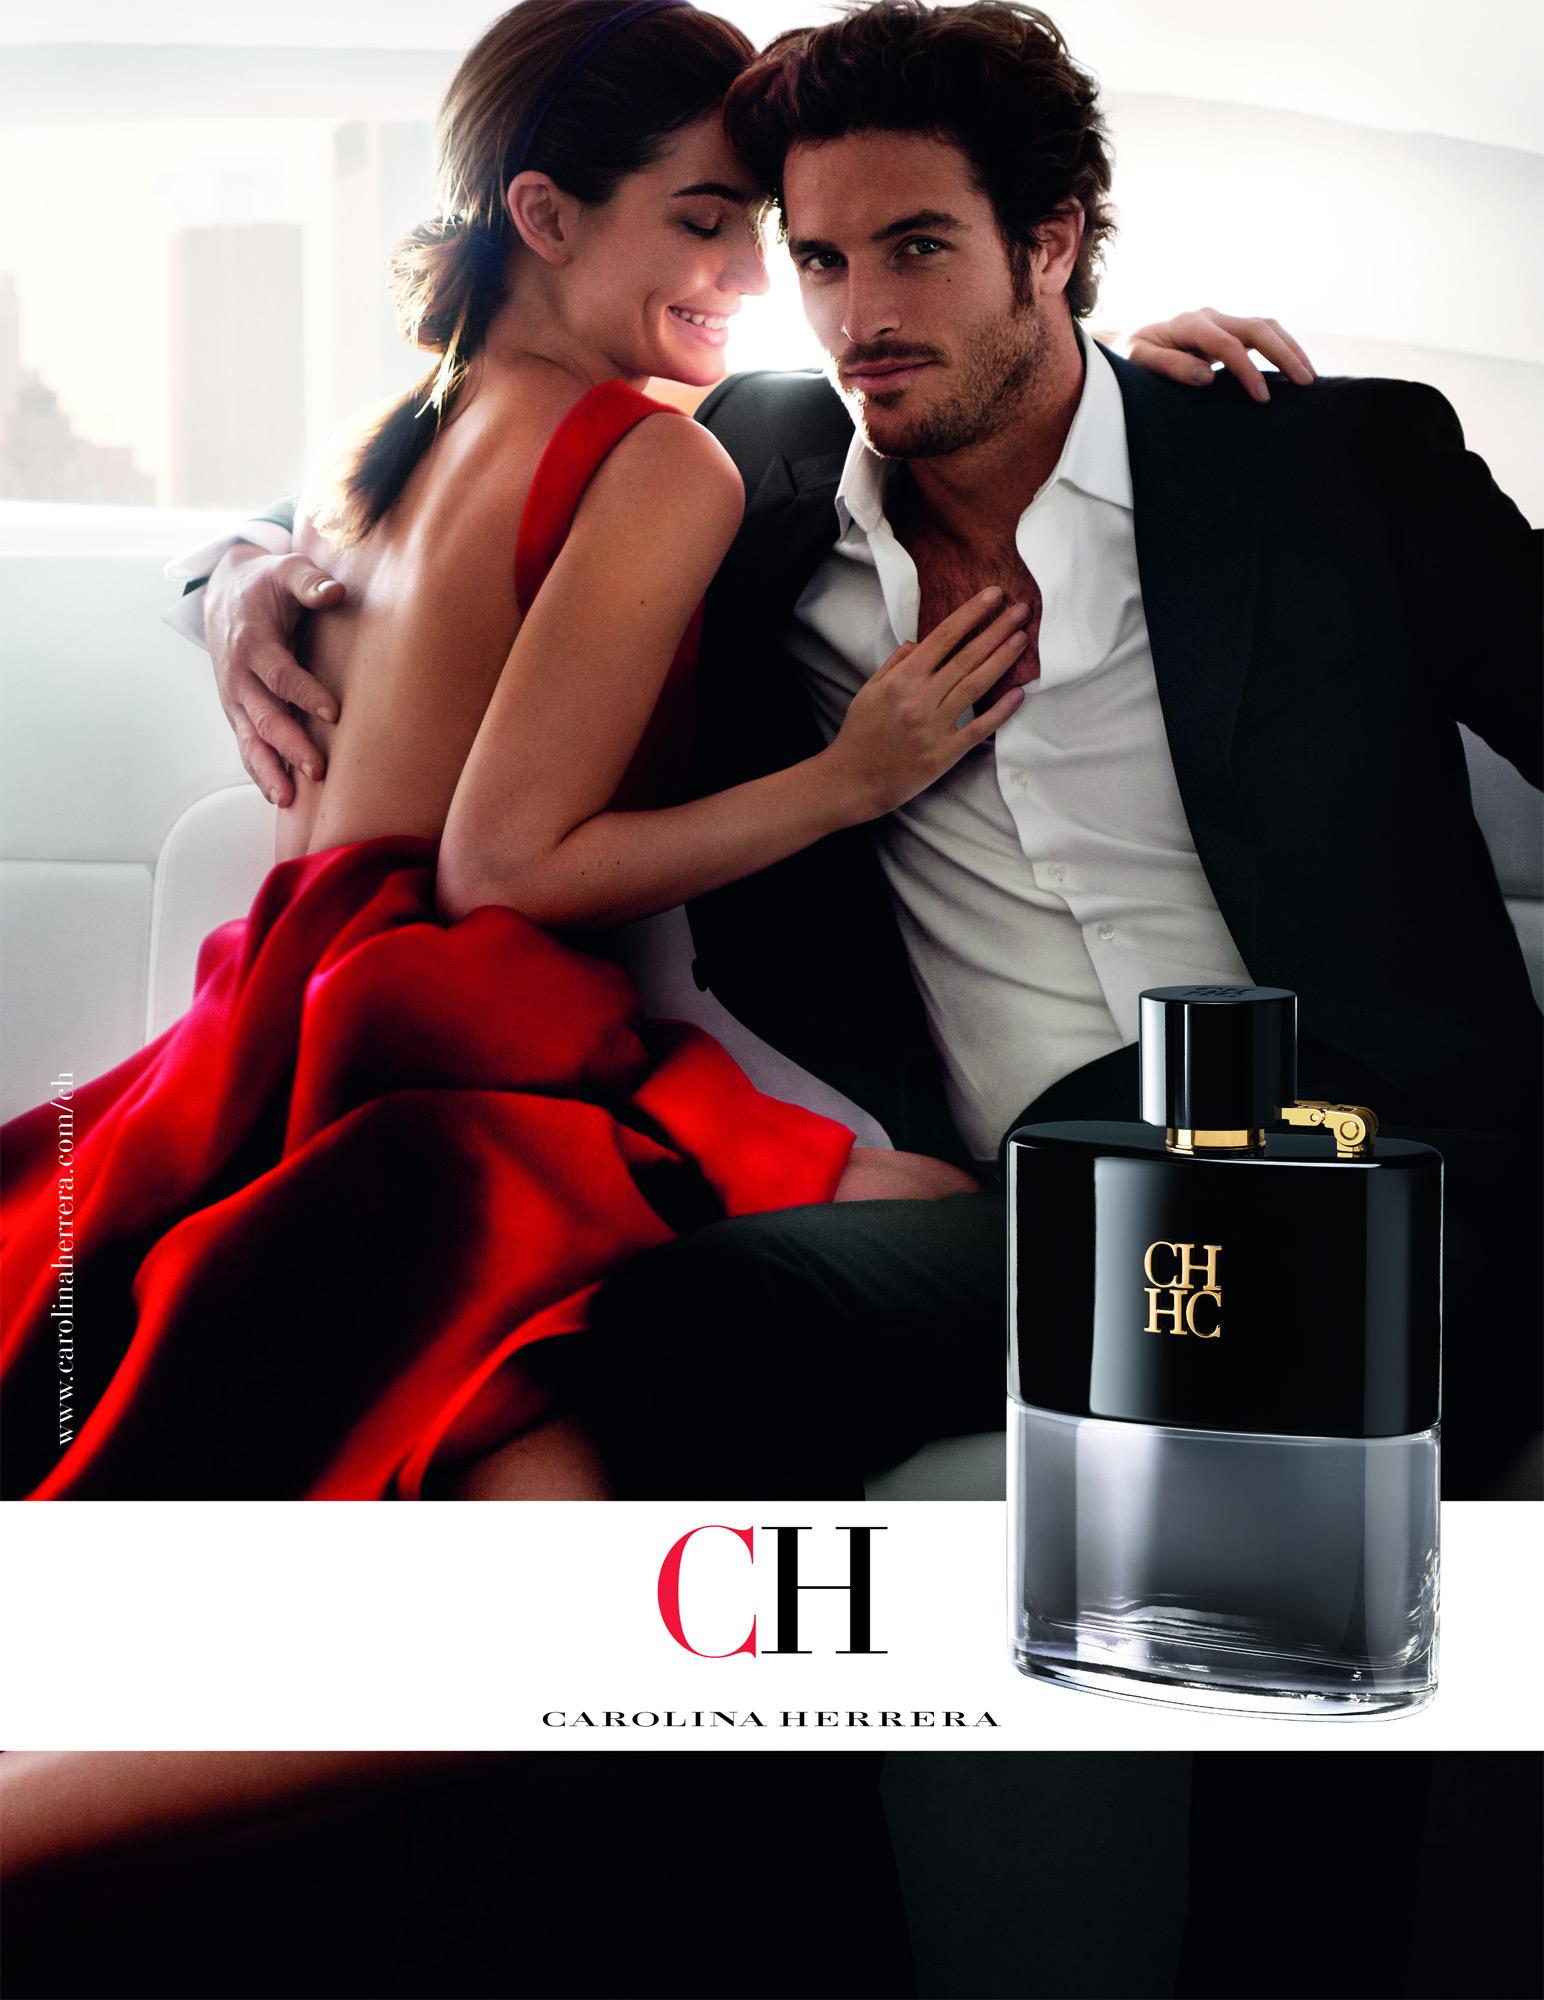 Carolina Herrera Ch And Ch Men Prive New Fragrances